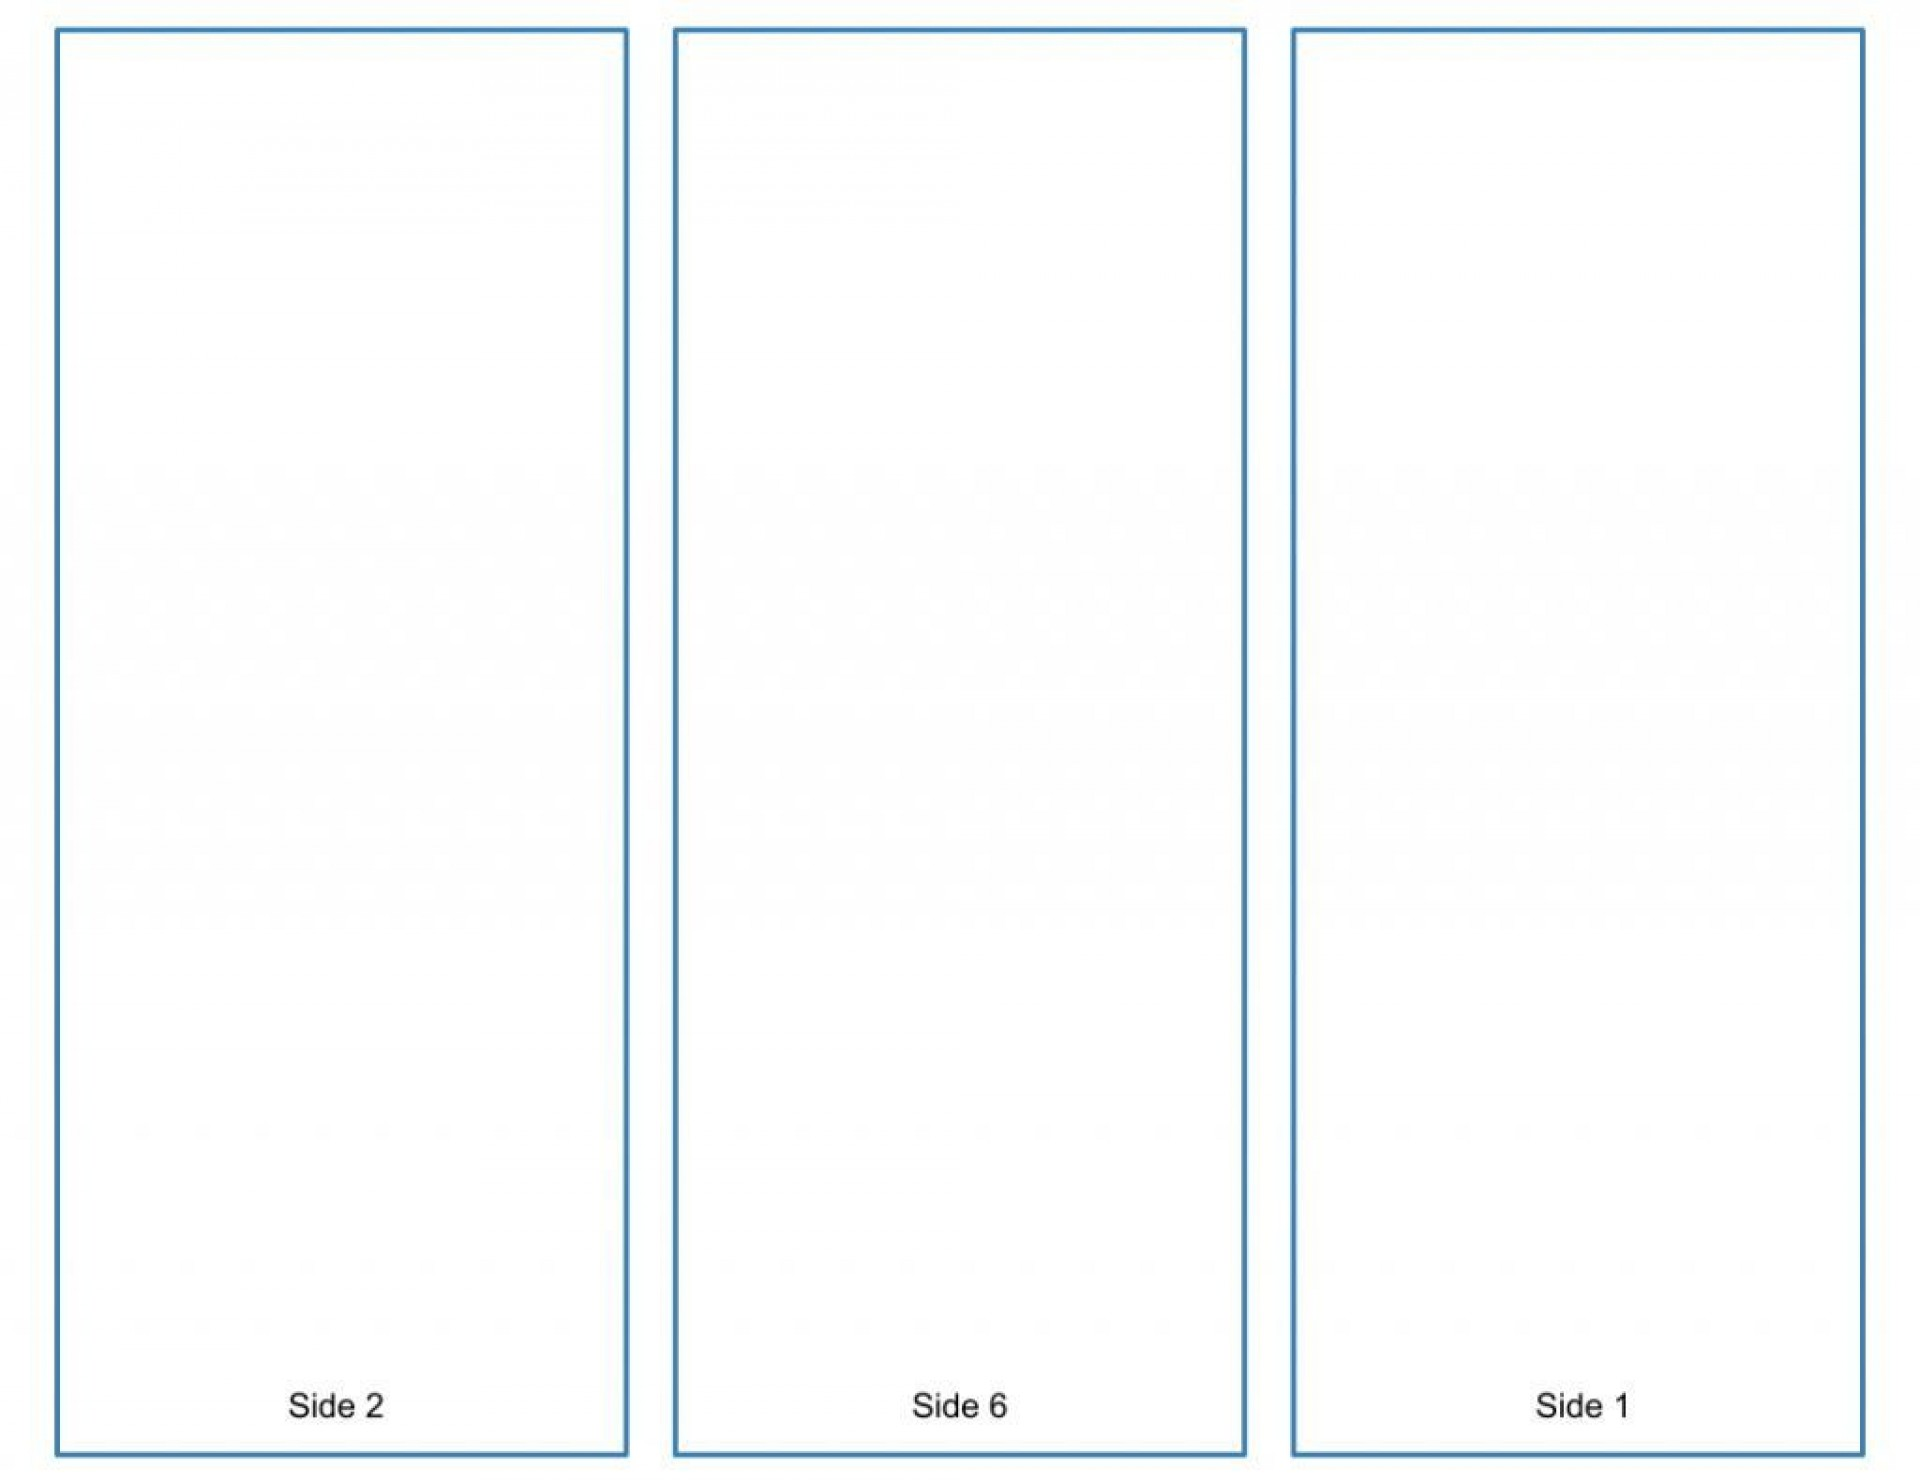 000 Stunning Brochure Template Google Drive Highest Quality  Free1920